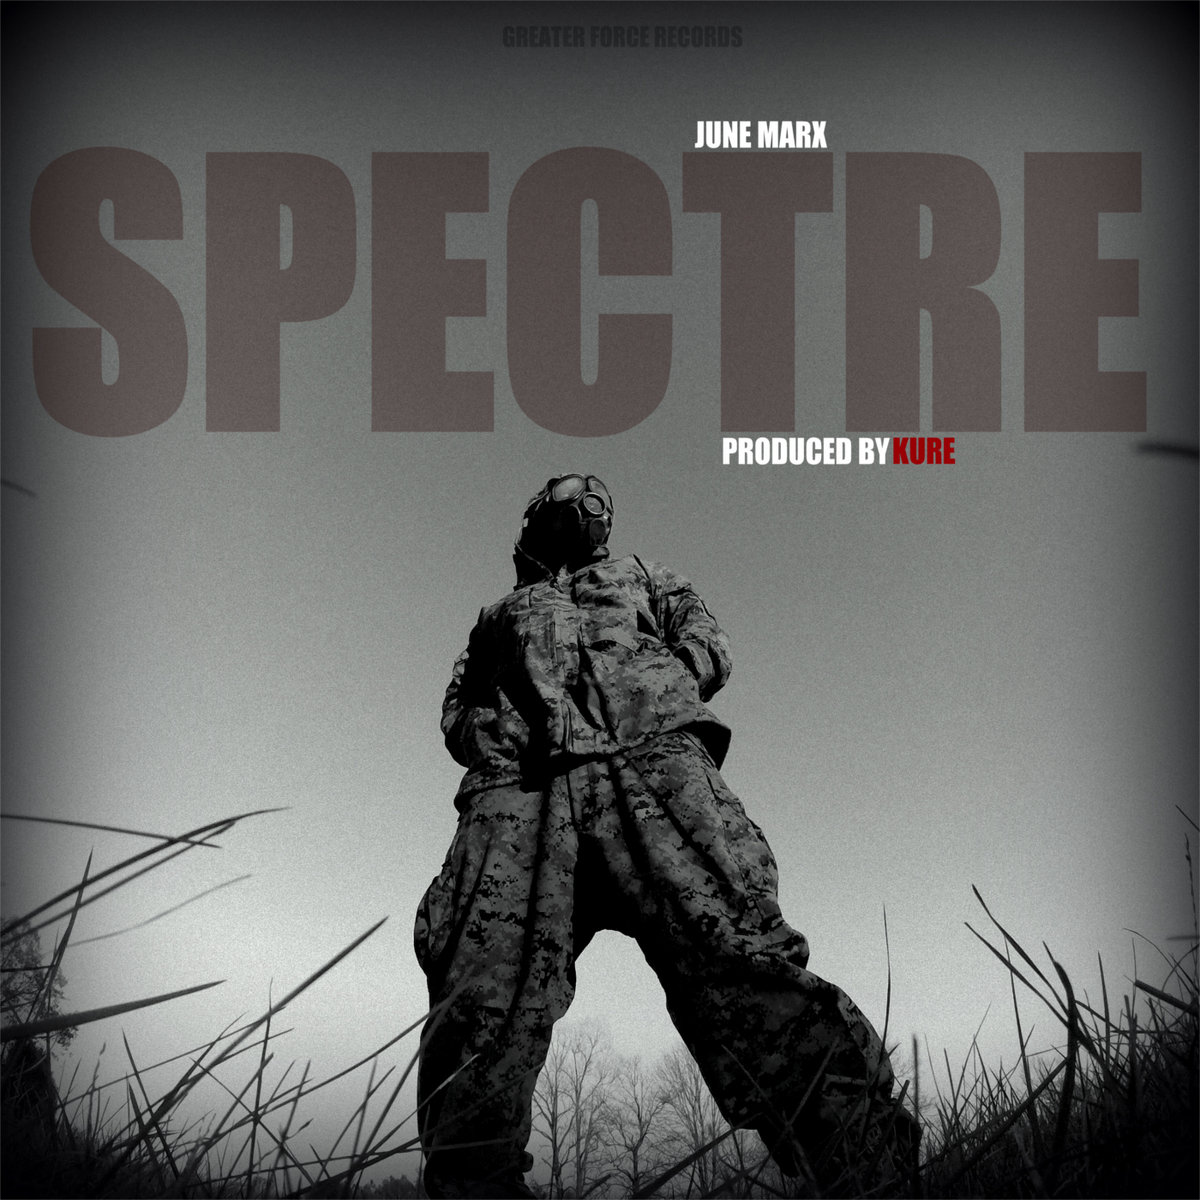 June_marx_-_spectre